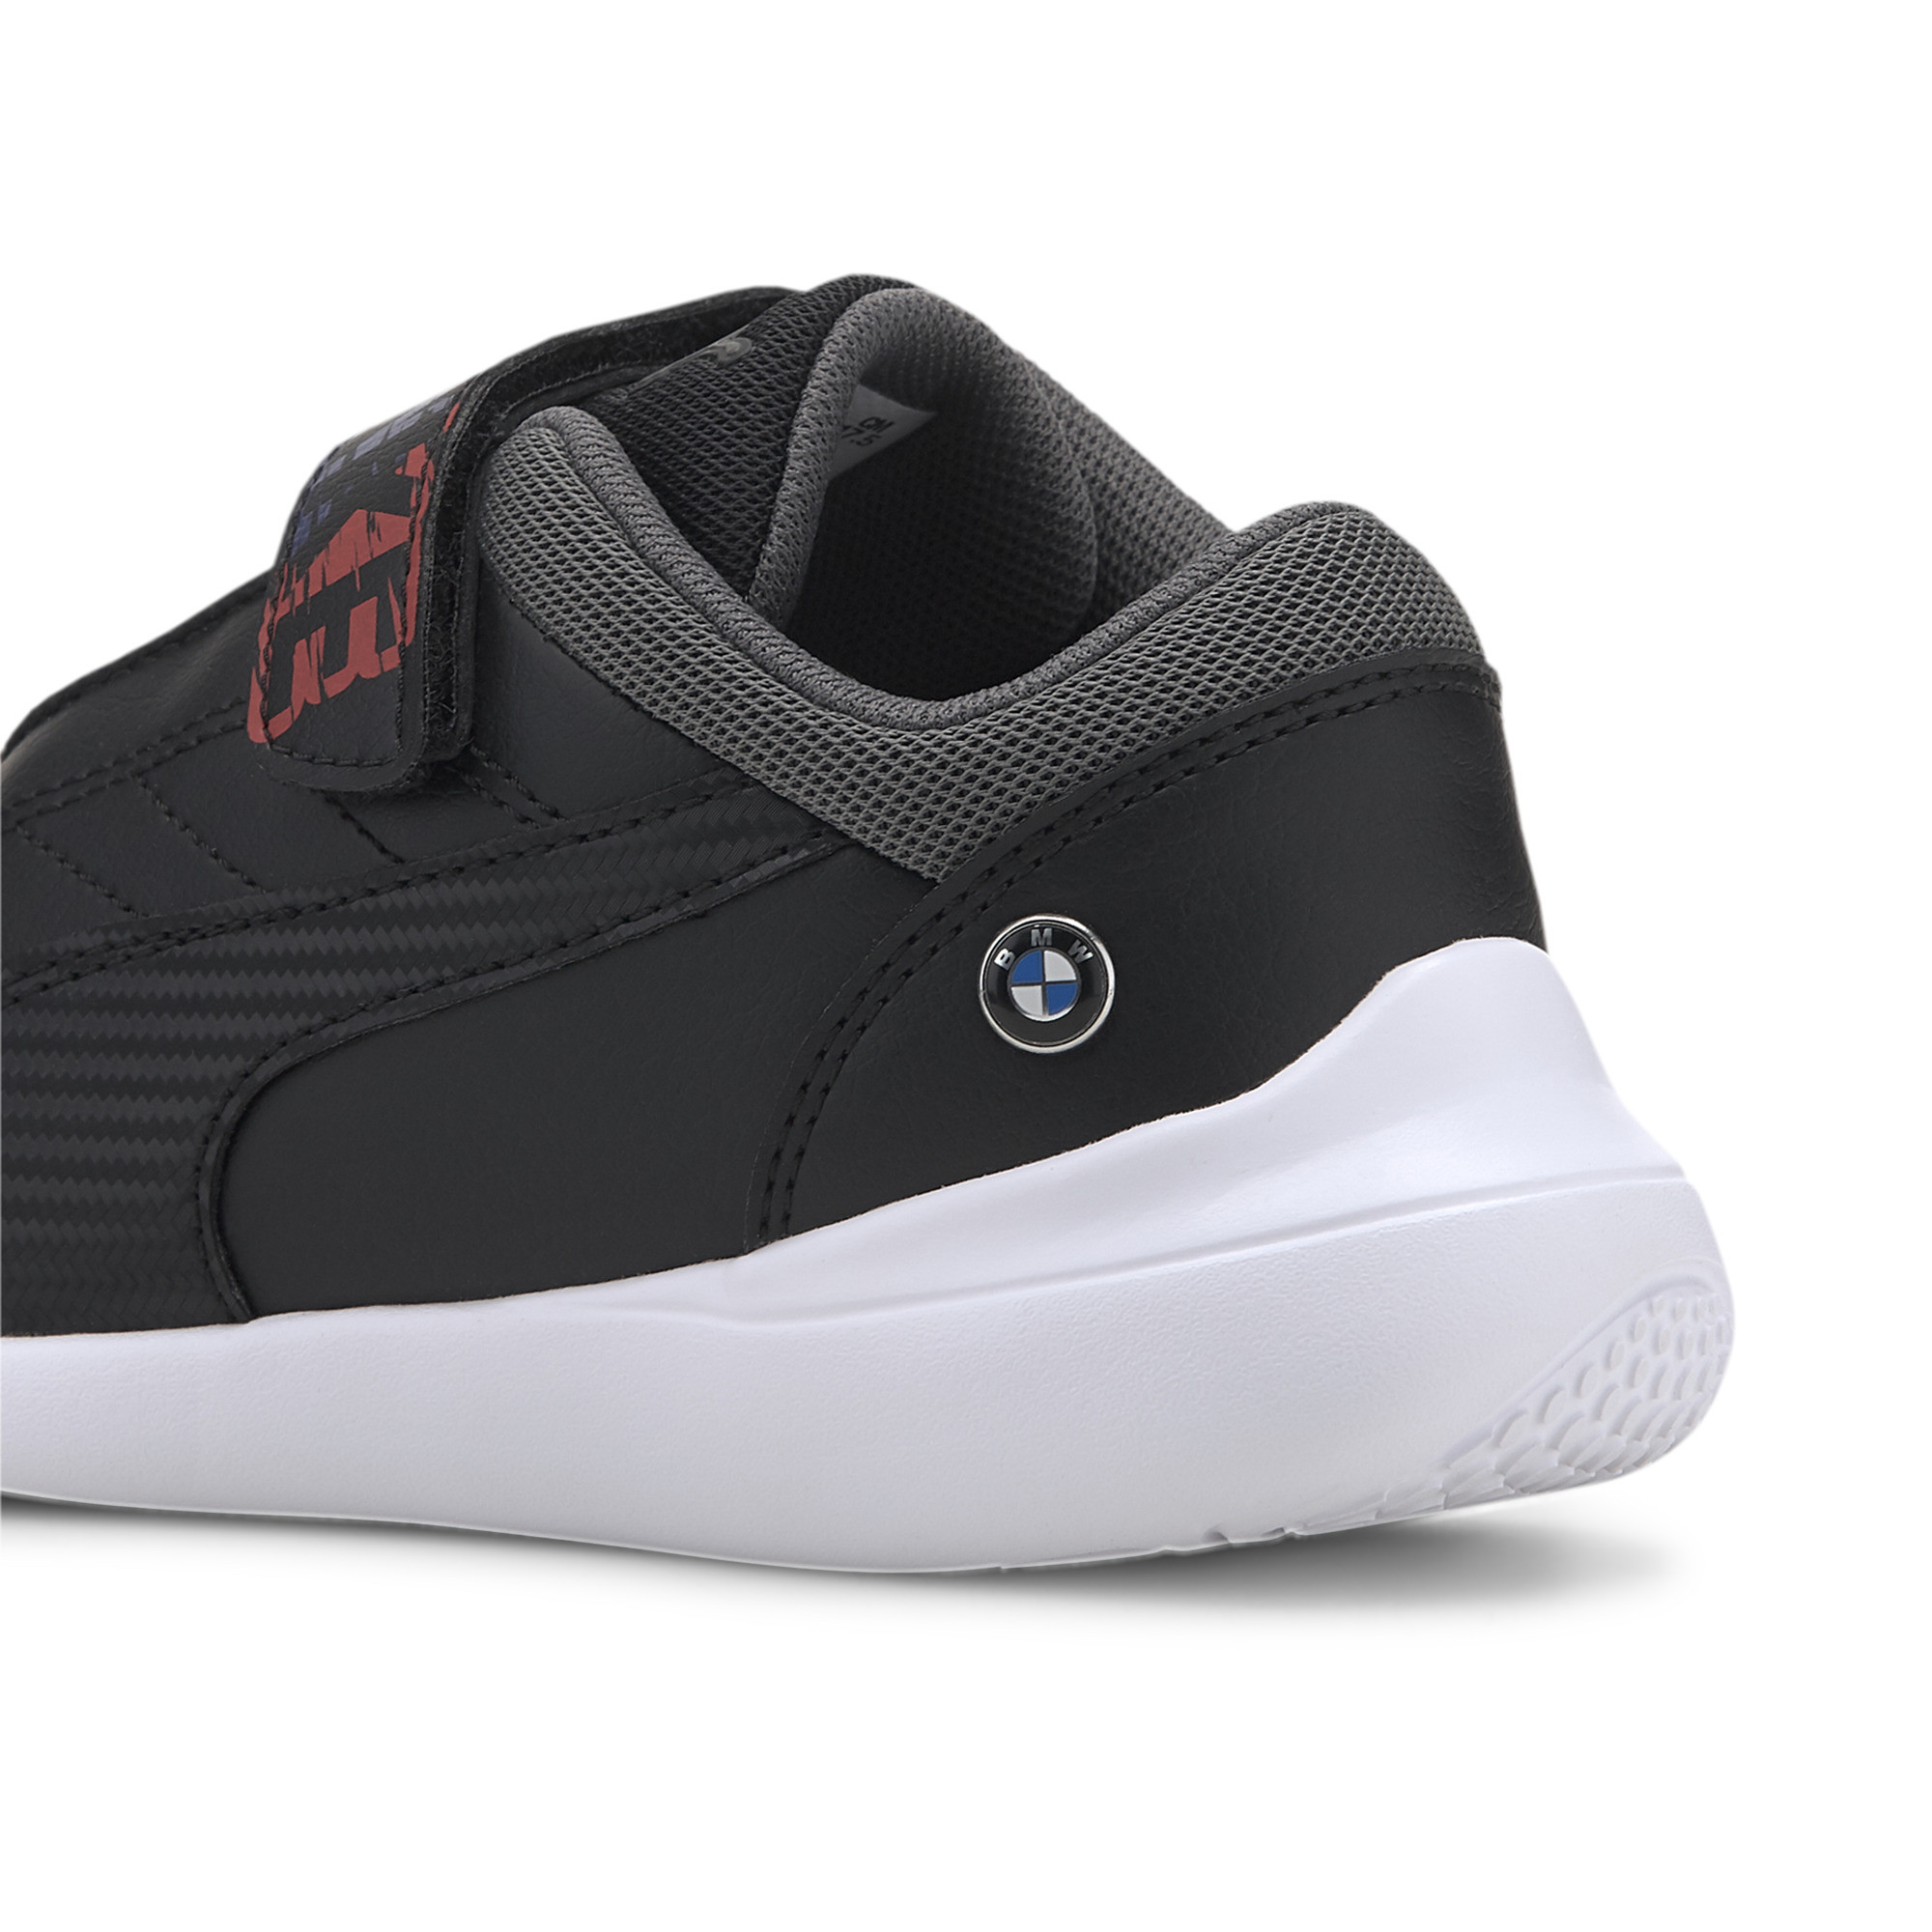 PUMA-Pre-School-BMW-M-Motorsport-Kart-Cat-III-Shoes thumbnail 8